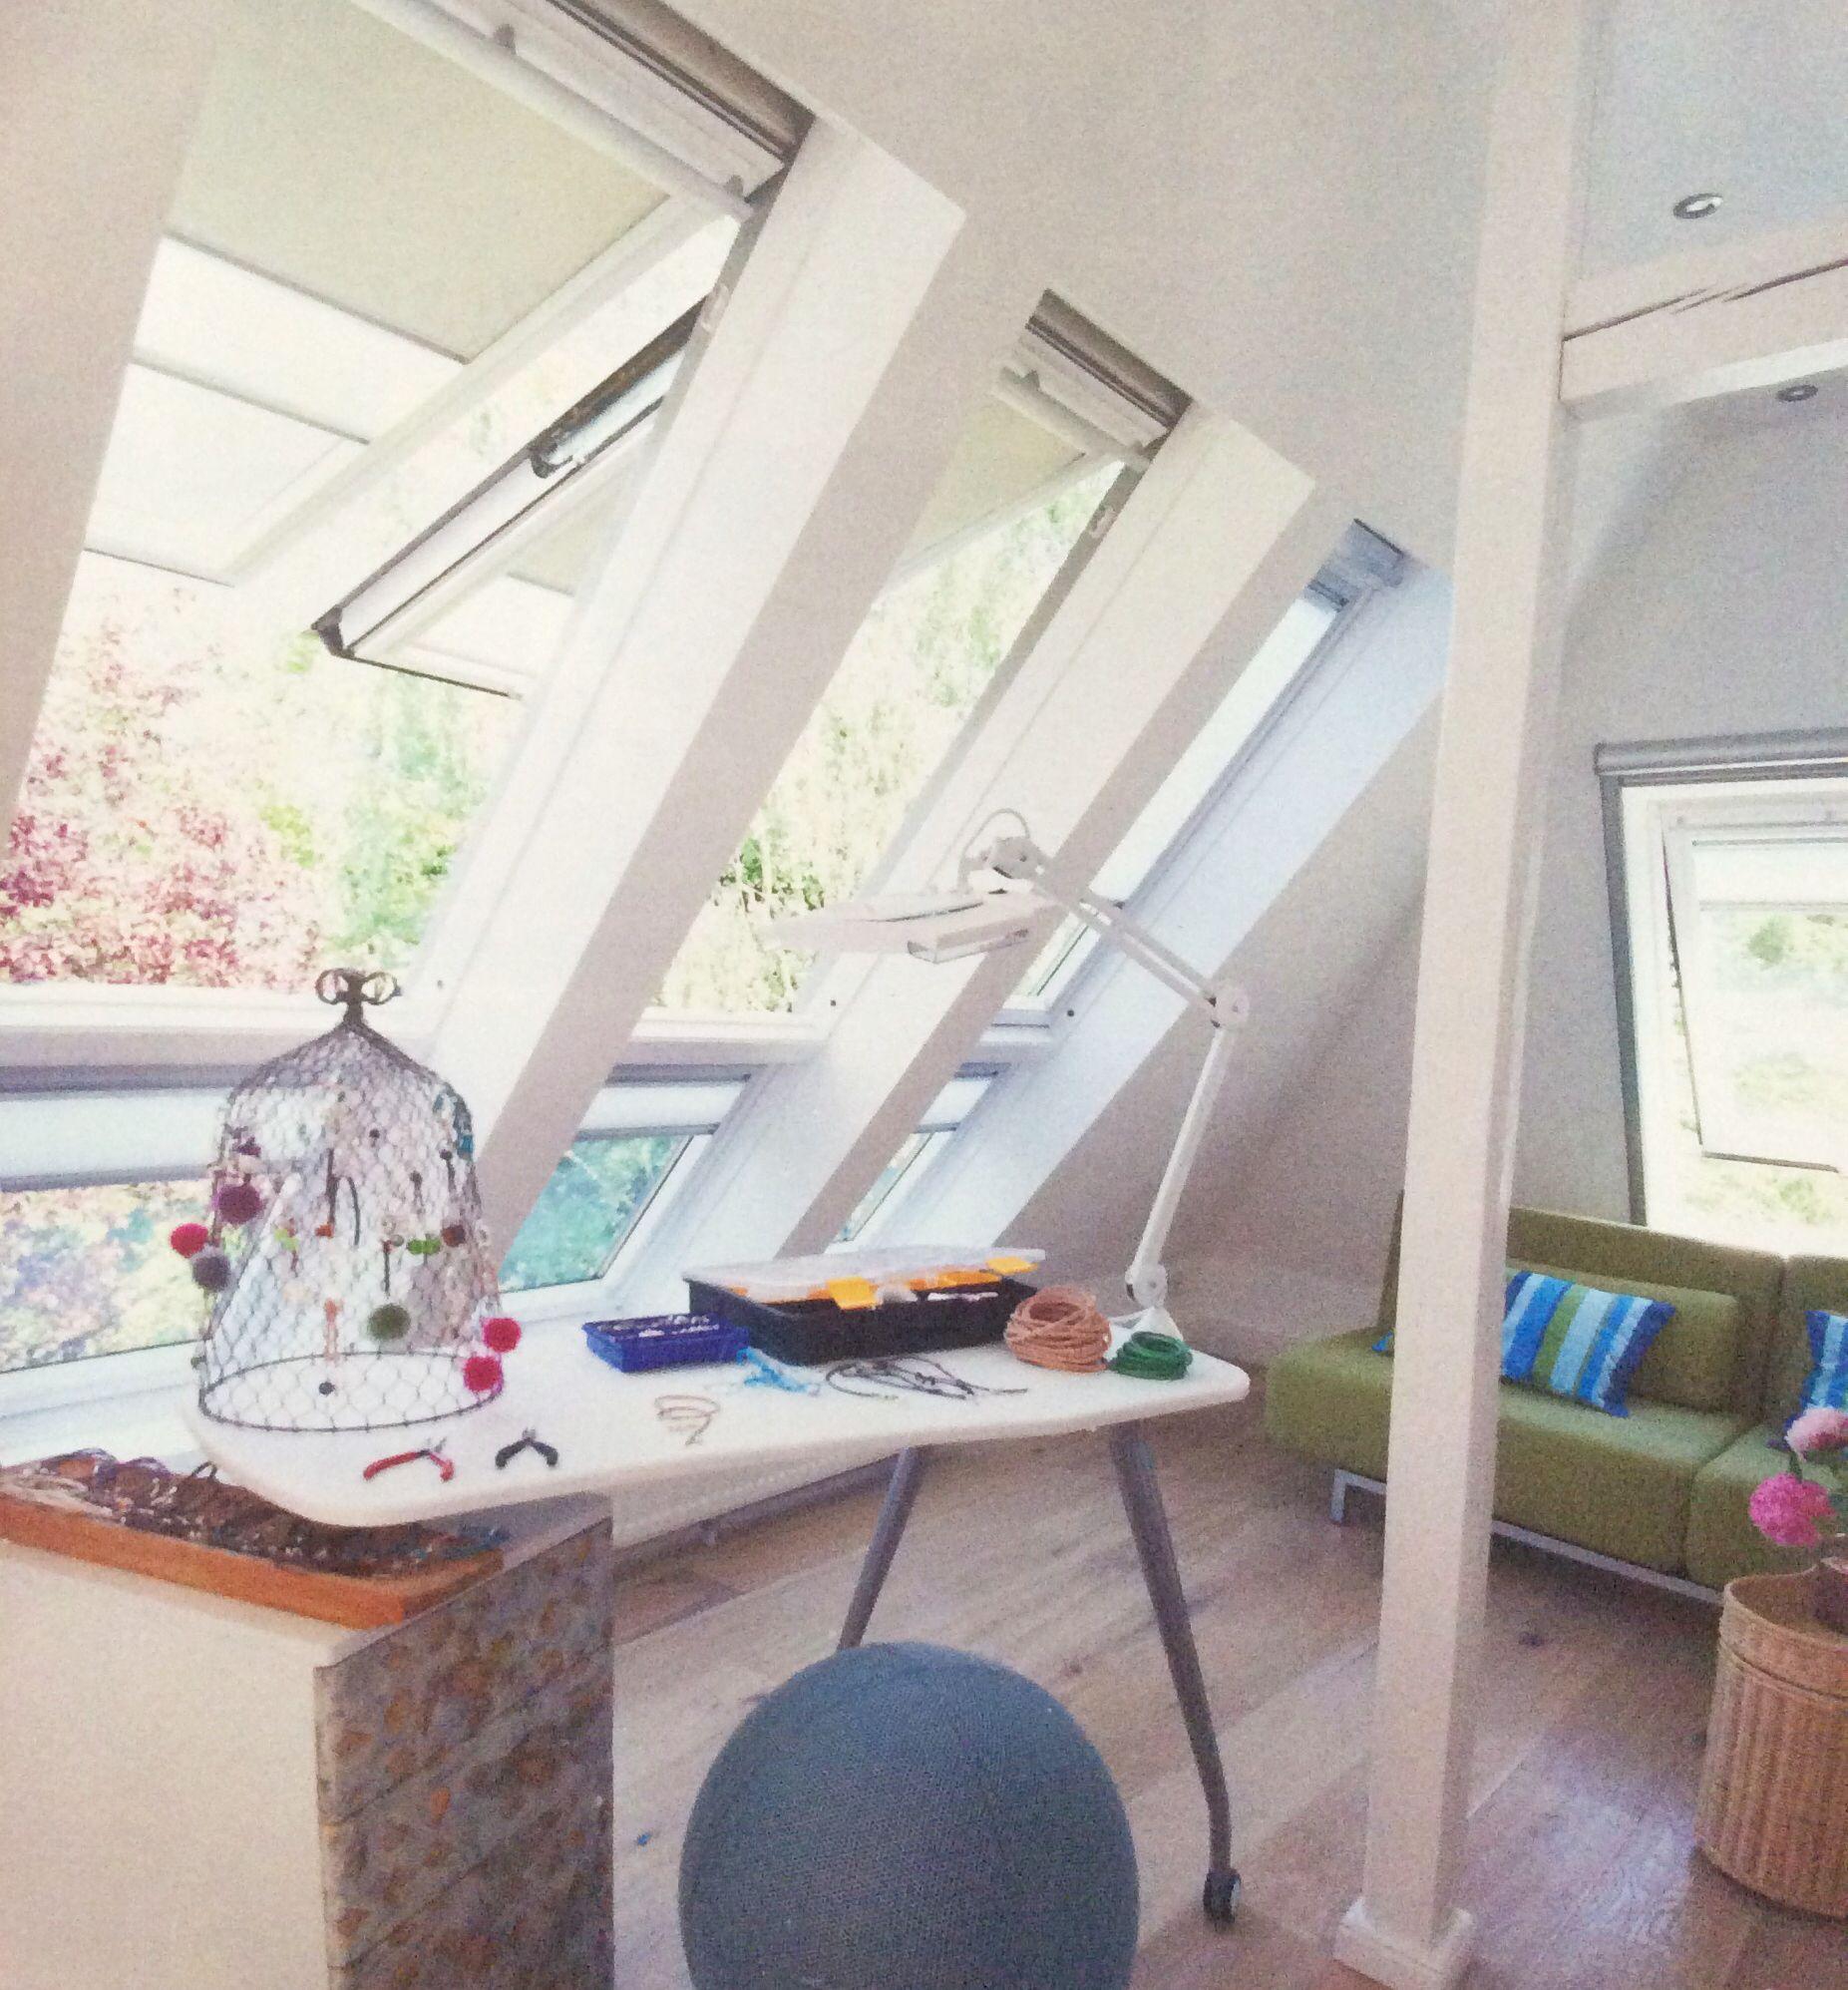 Spitzboden, Dachboden, Dachflächenfenster, Fenster, Büro, Homeoffice ...